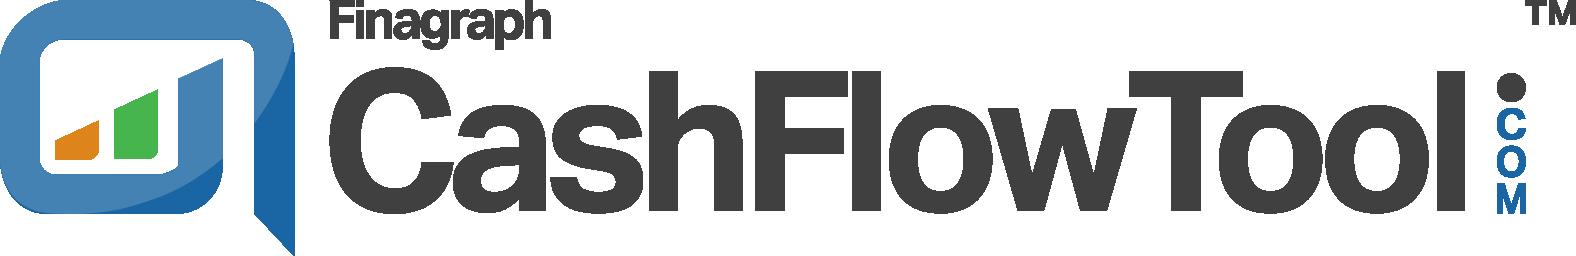 cashflowtool.com-logo-color-black-text-hi-res